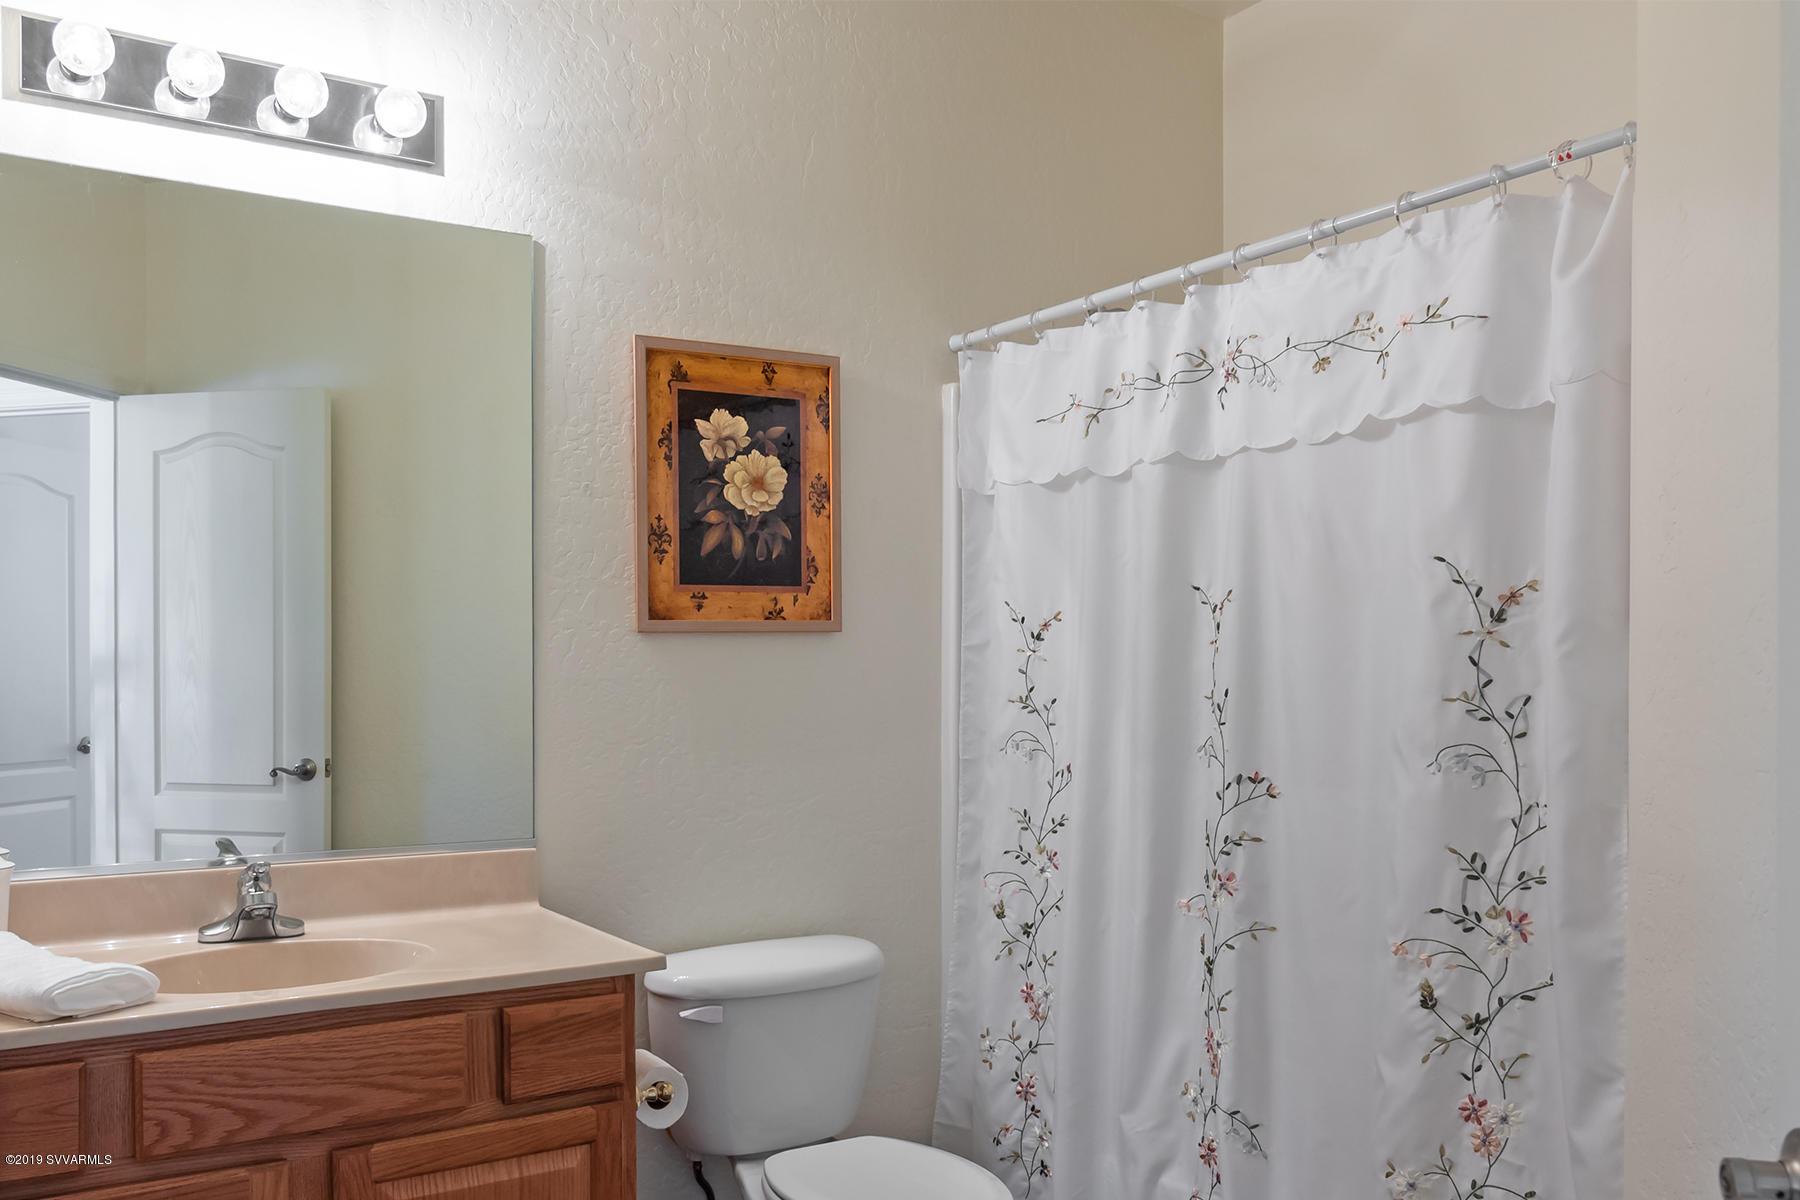 525 S Santa Fe Tr Cornville, AZ 86325